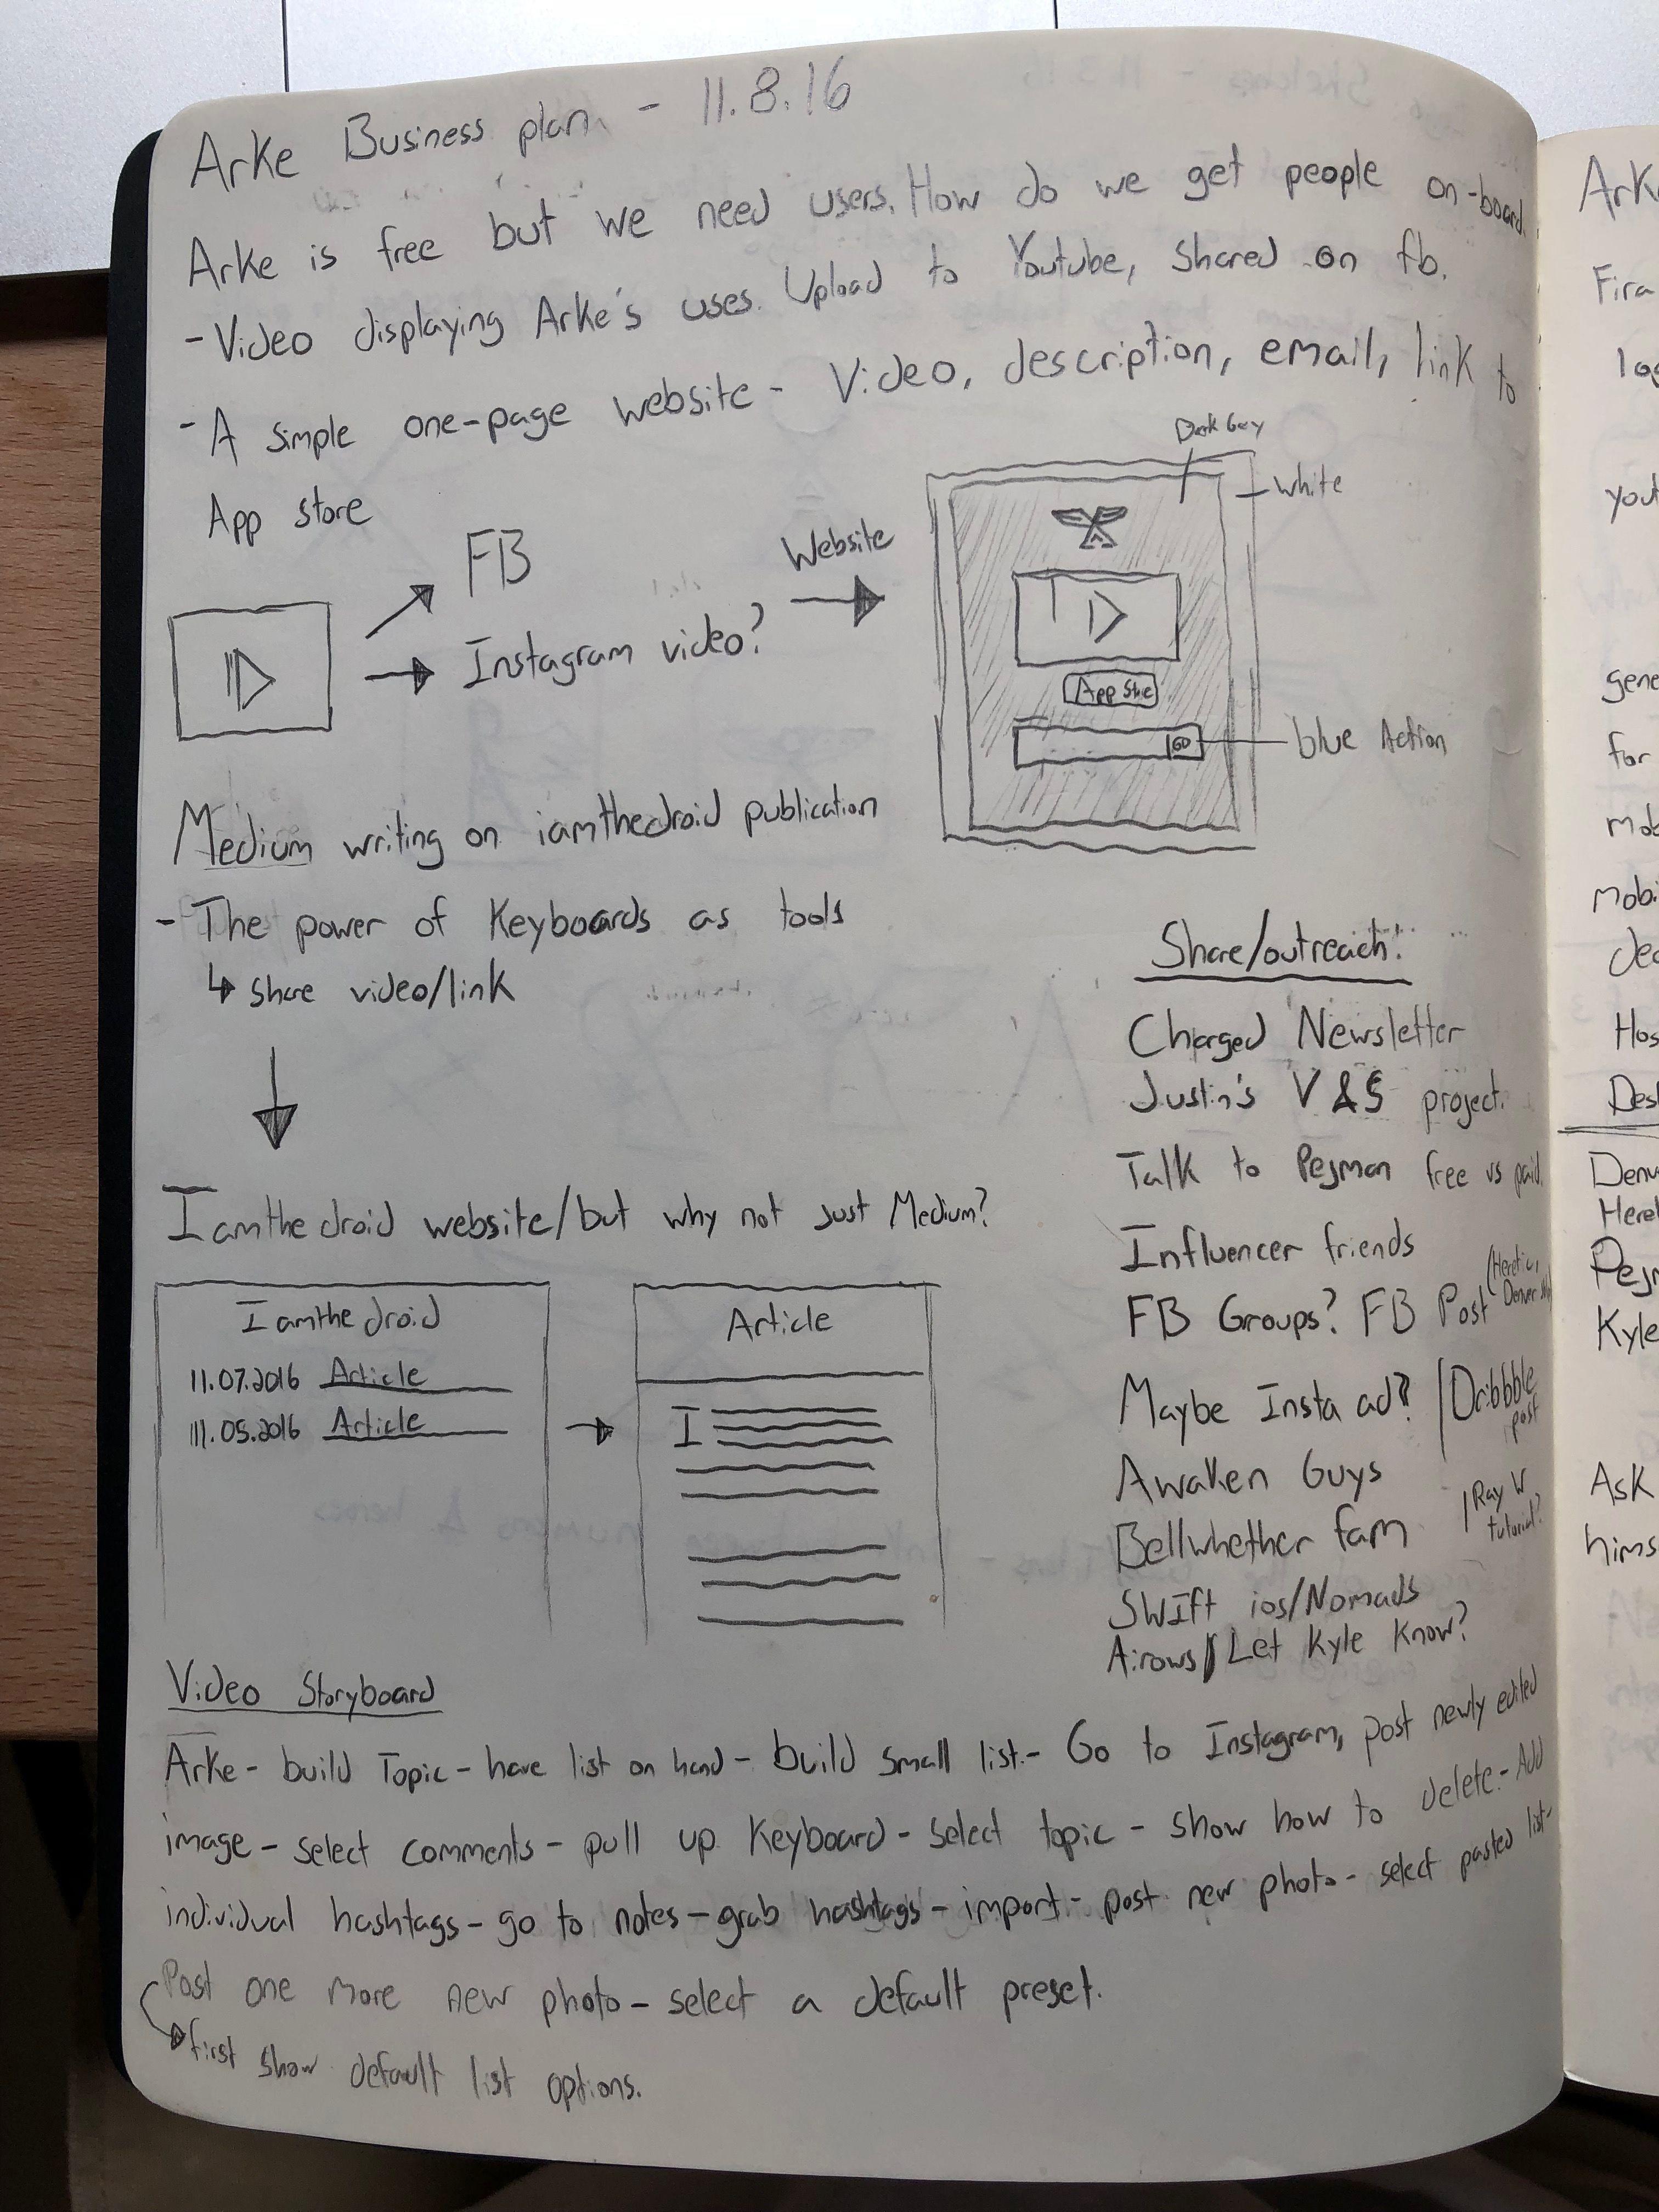 Arke Launch Brainstorm 1